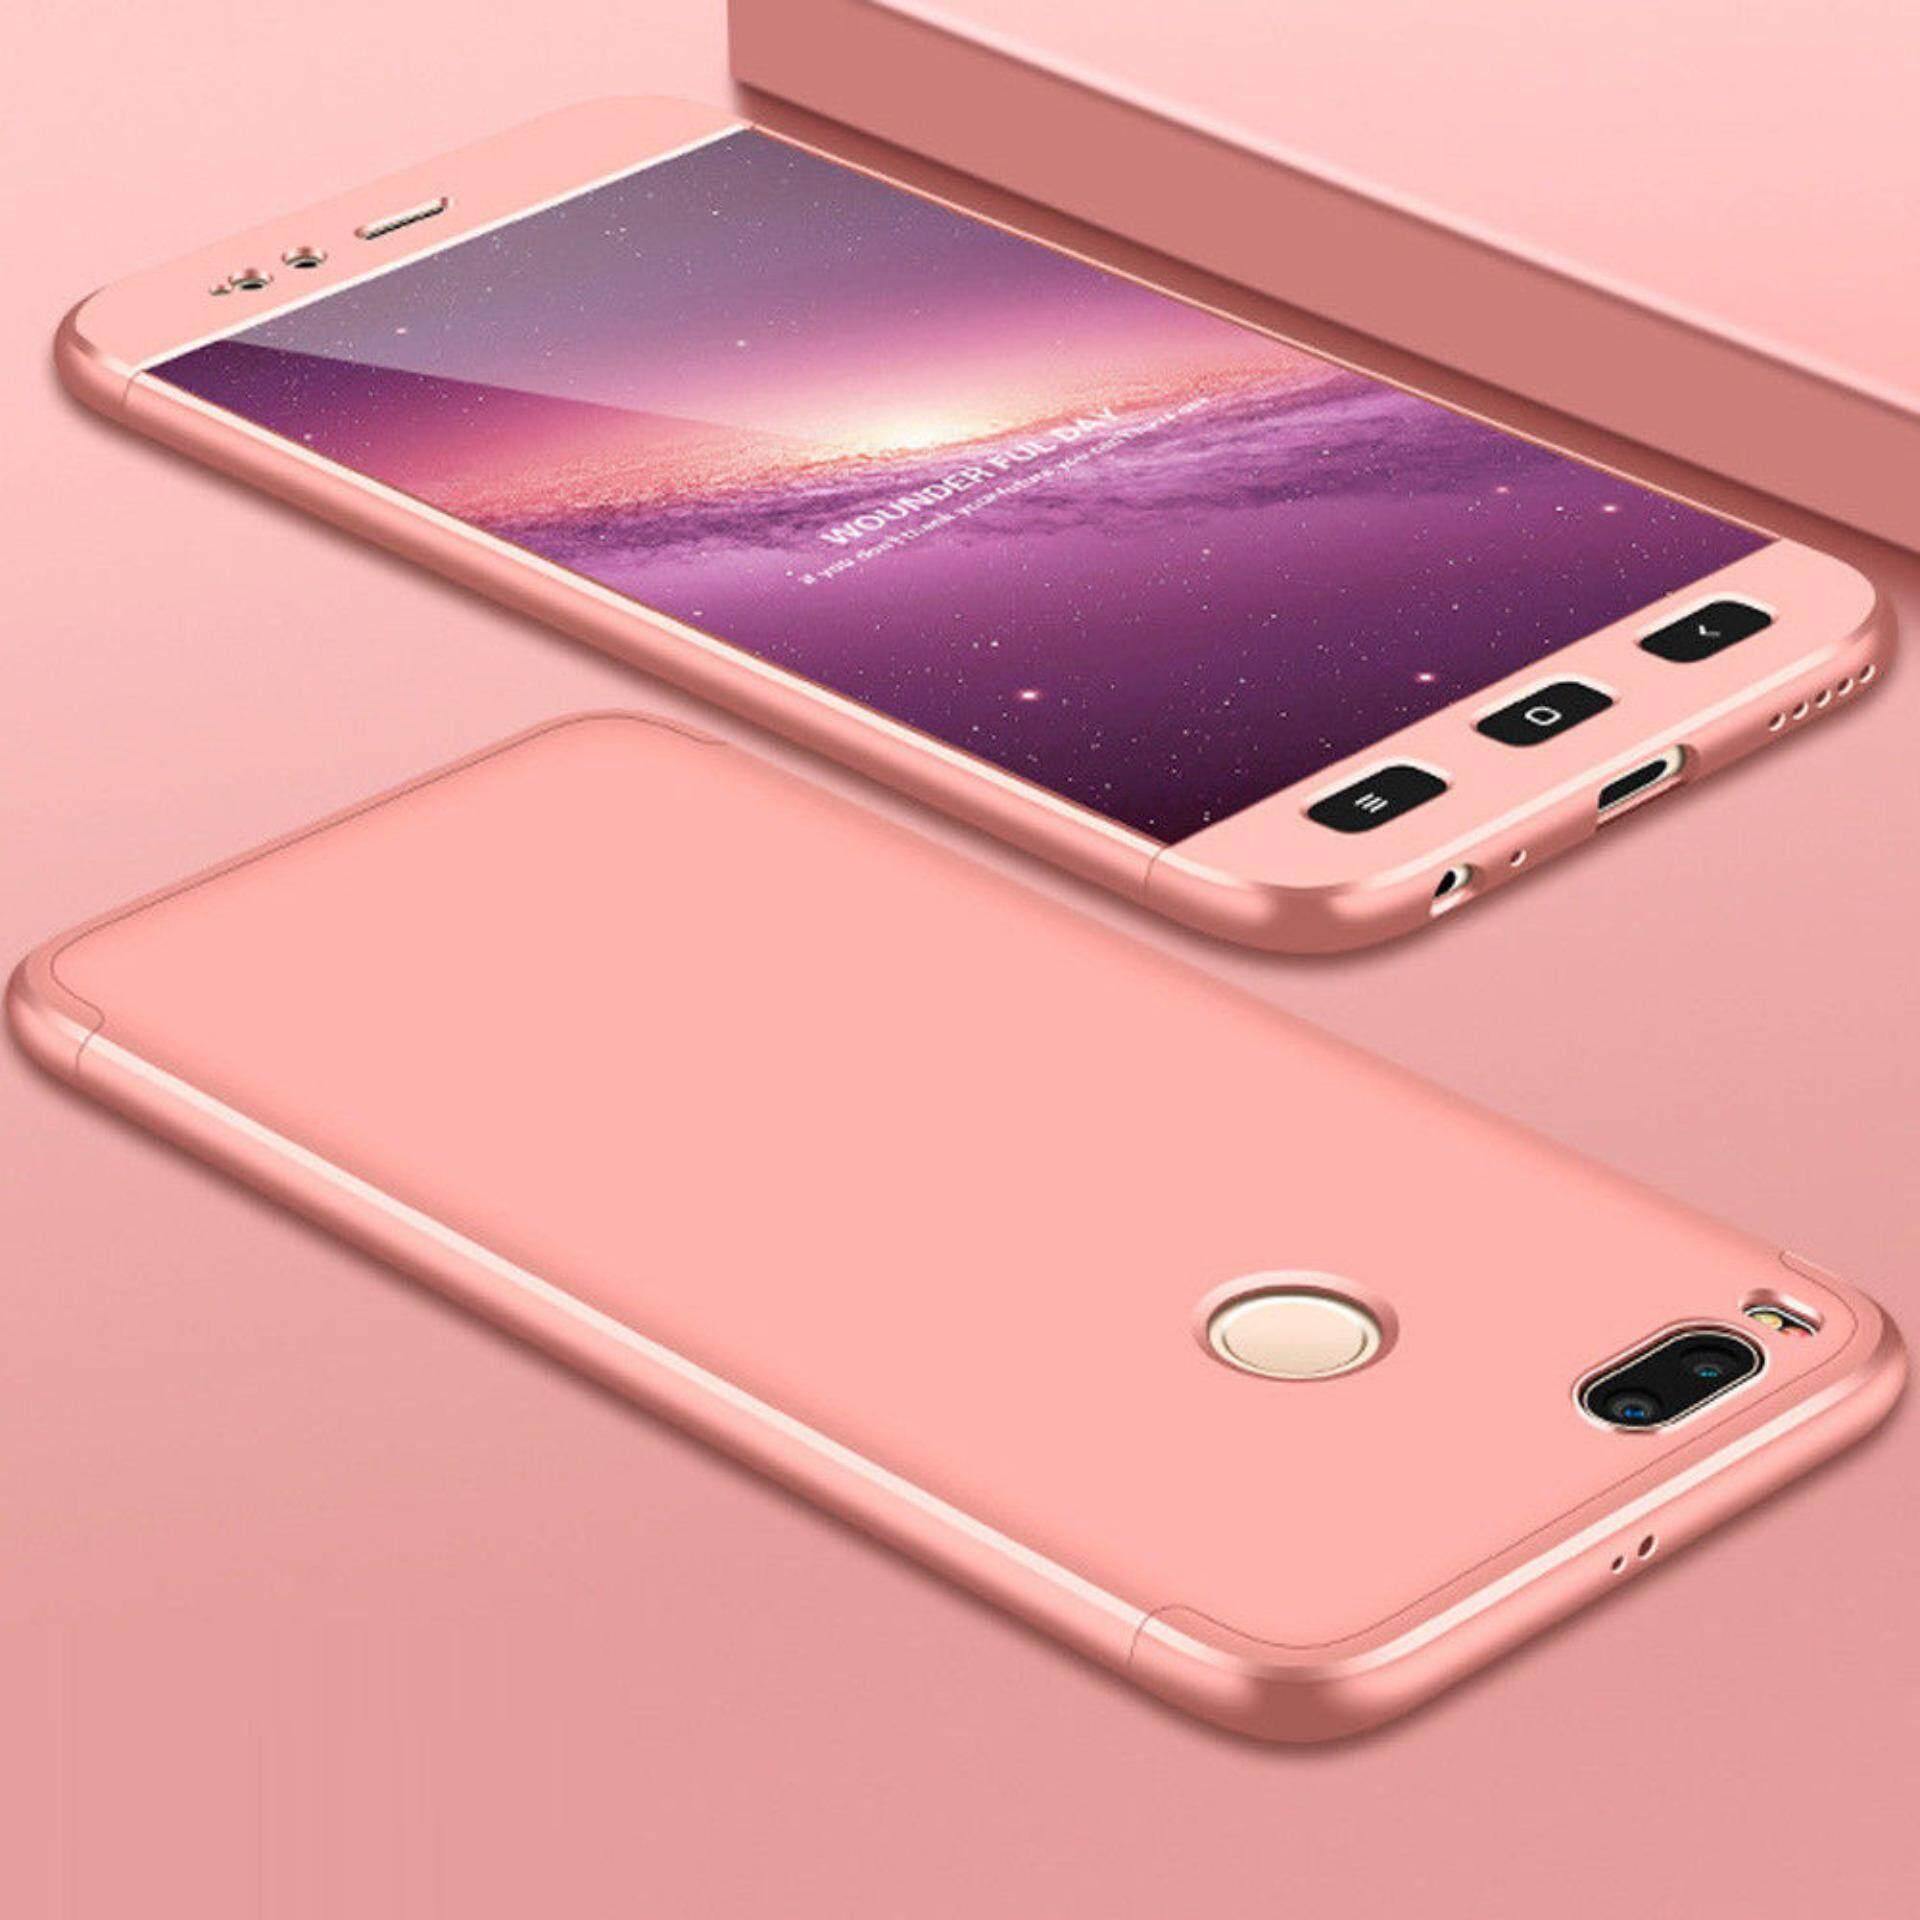 Michellisto Xiaomi Redmi Note 2 Prime Backdoor Back Case Casingcover 4a Casing Cover Original